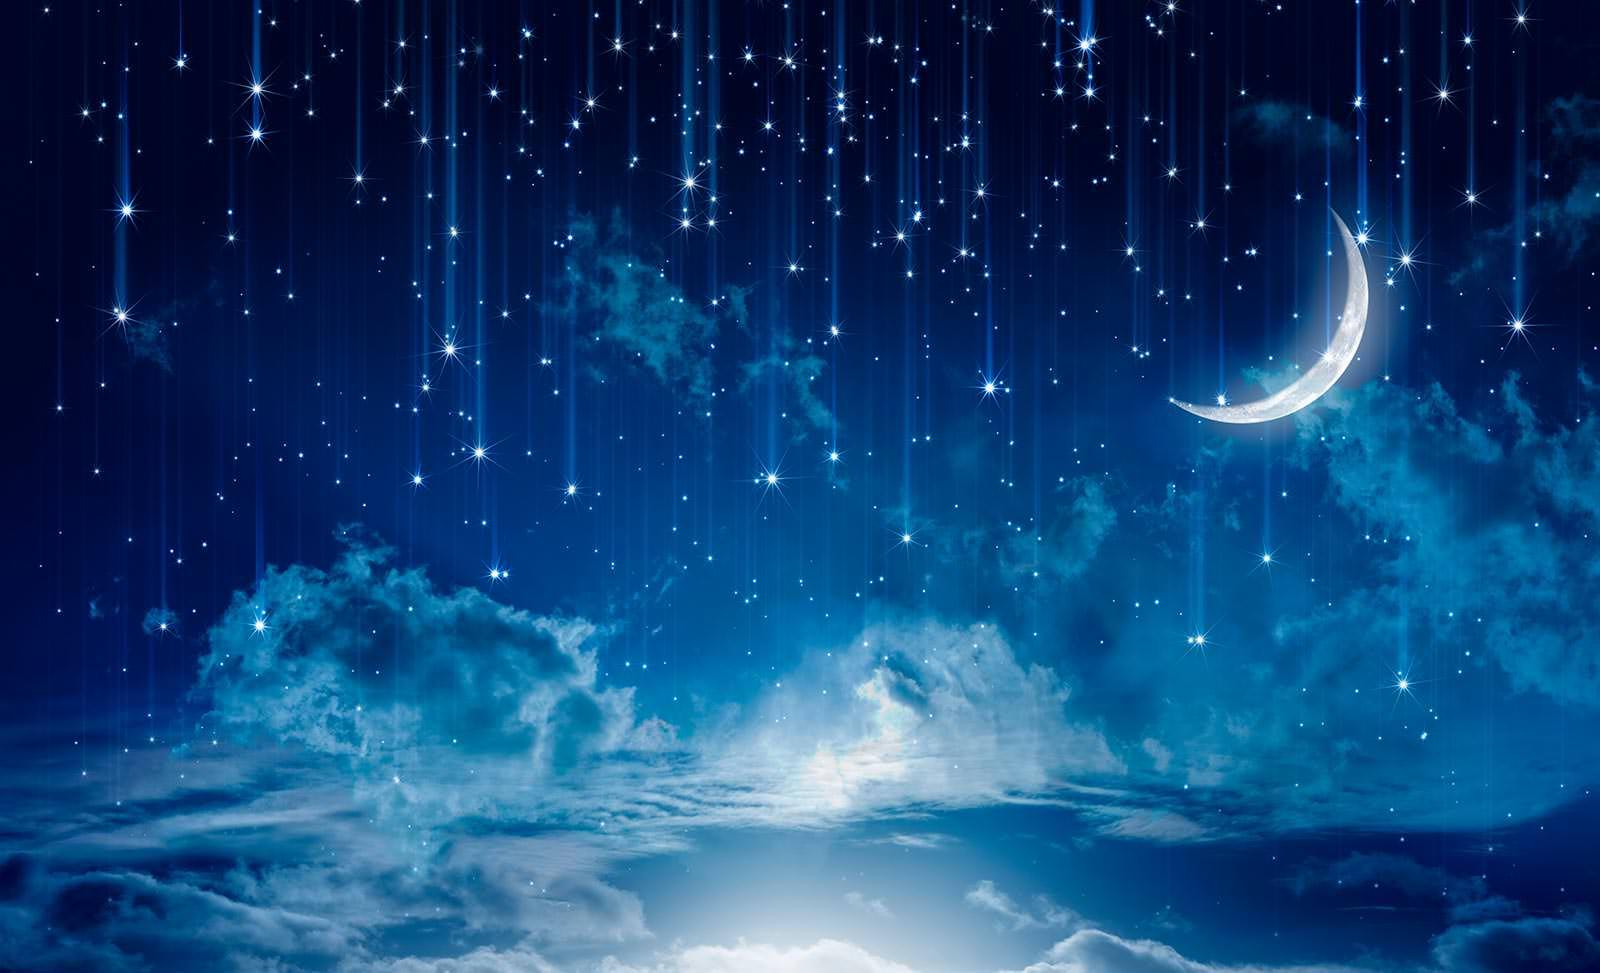 Free stock photo of black wallpaper night sky  Pexels